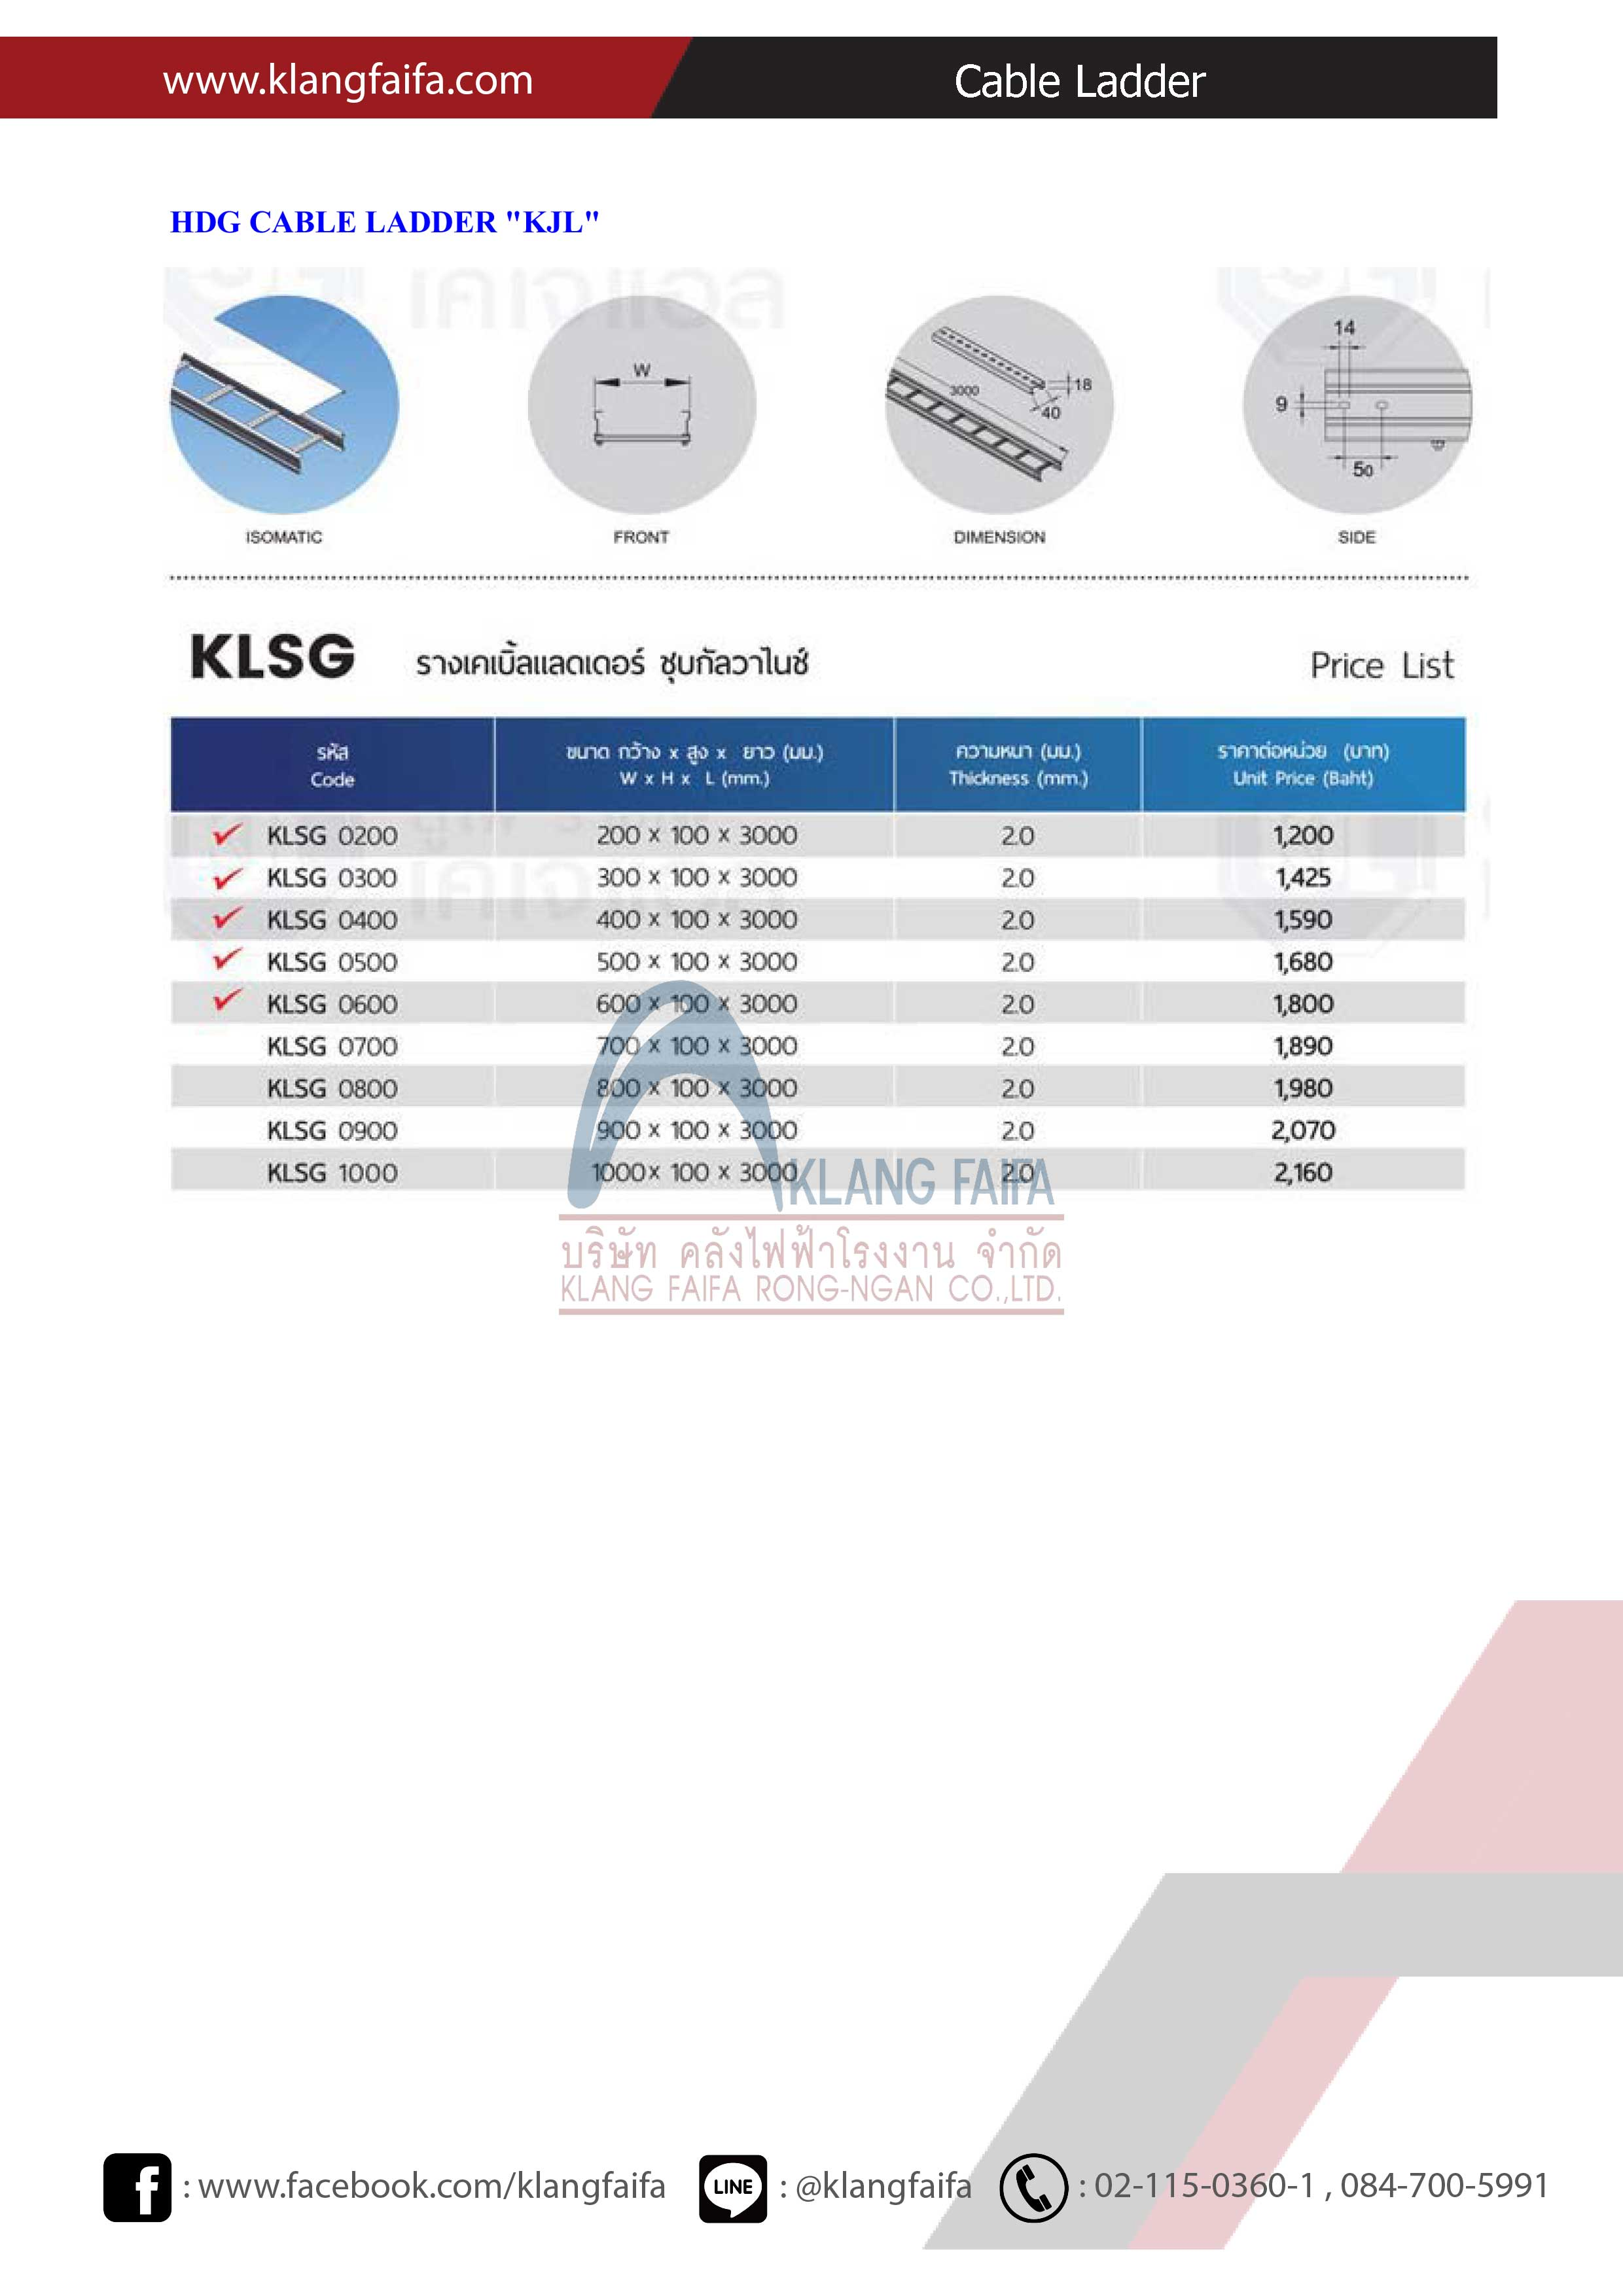 KJL-Cable-Ladder, เคเบิ้ลแลดเดอร์ชุบกัลวาไนท์เคเจแอล, KJL, เคเบิ้ลแลดเดอร์เคเจแอล